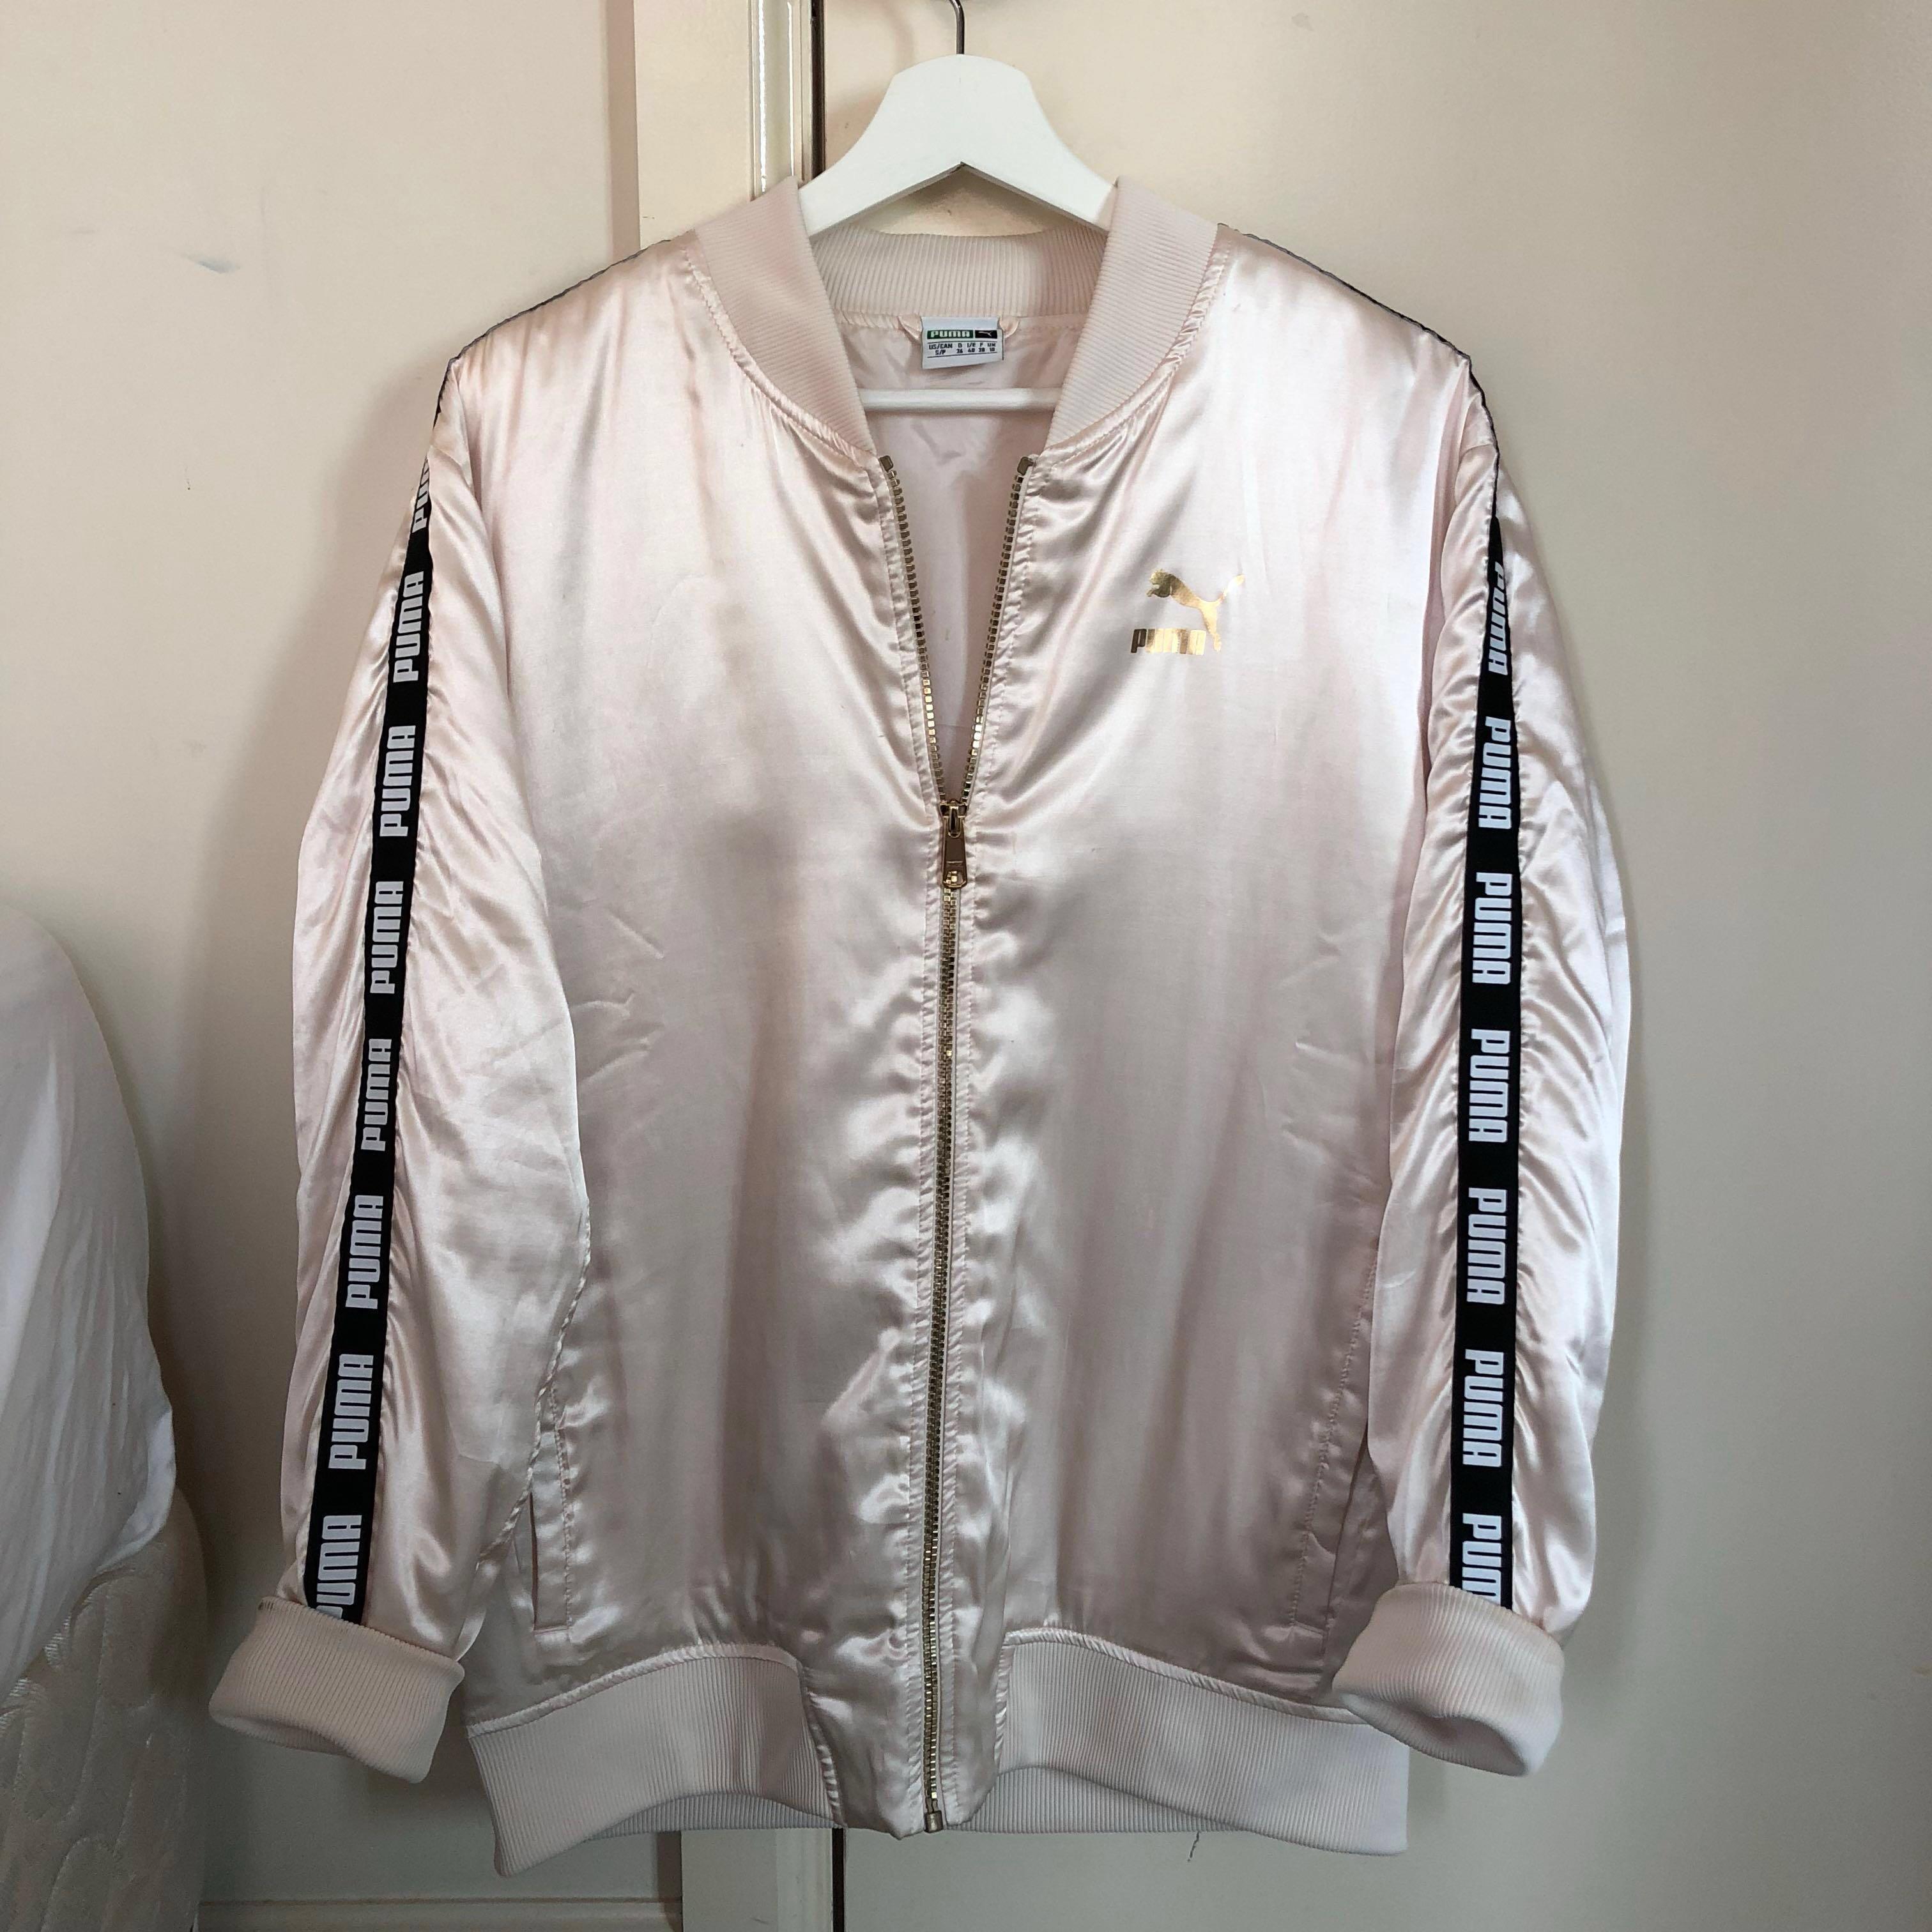 PUMA Champagne Bomber Jacket